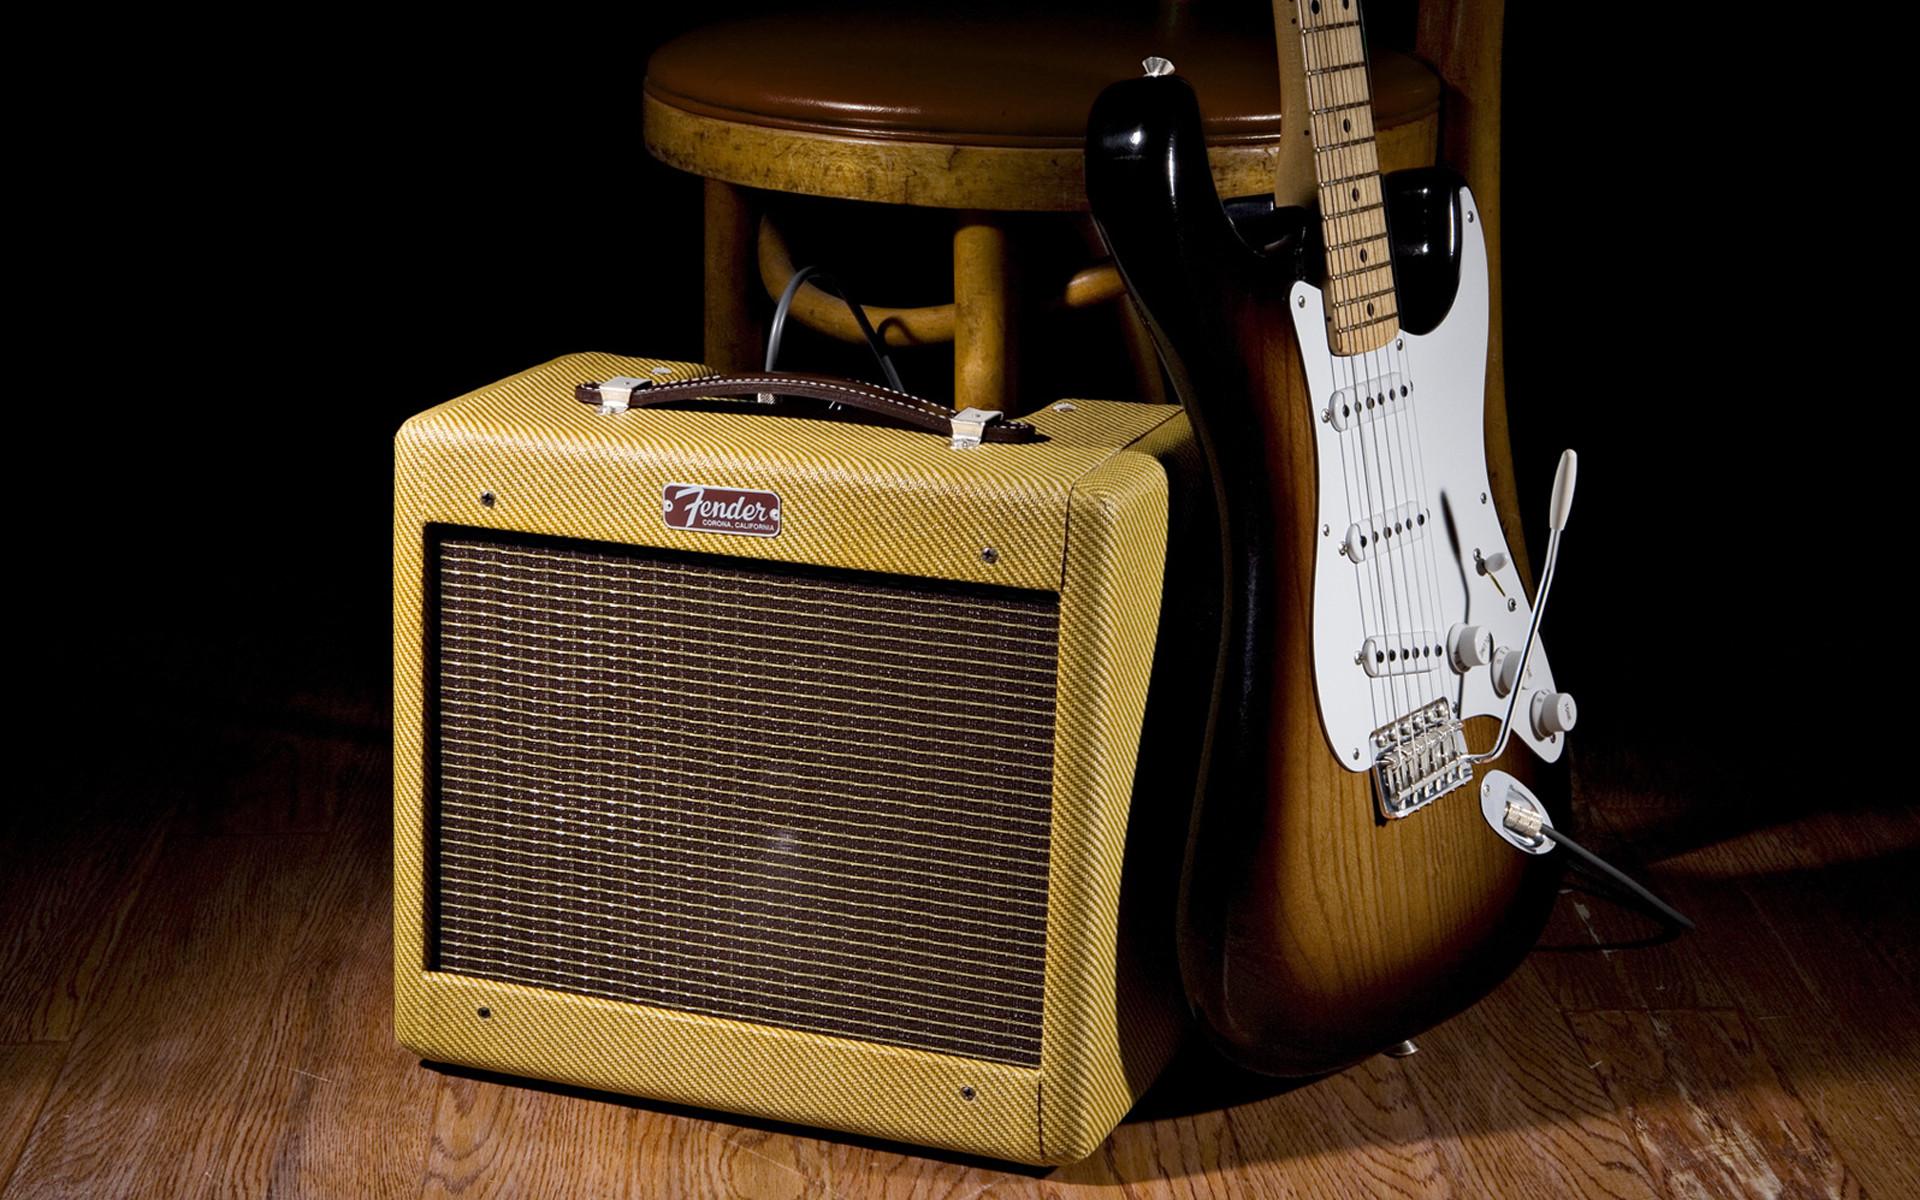 Fonds d?cran Fender : tous les wallpapers Fender